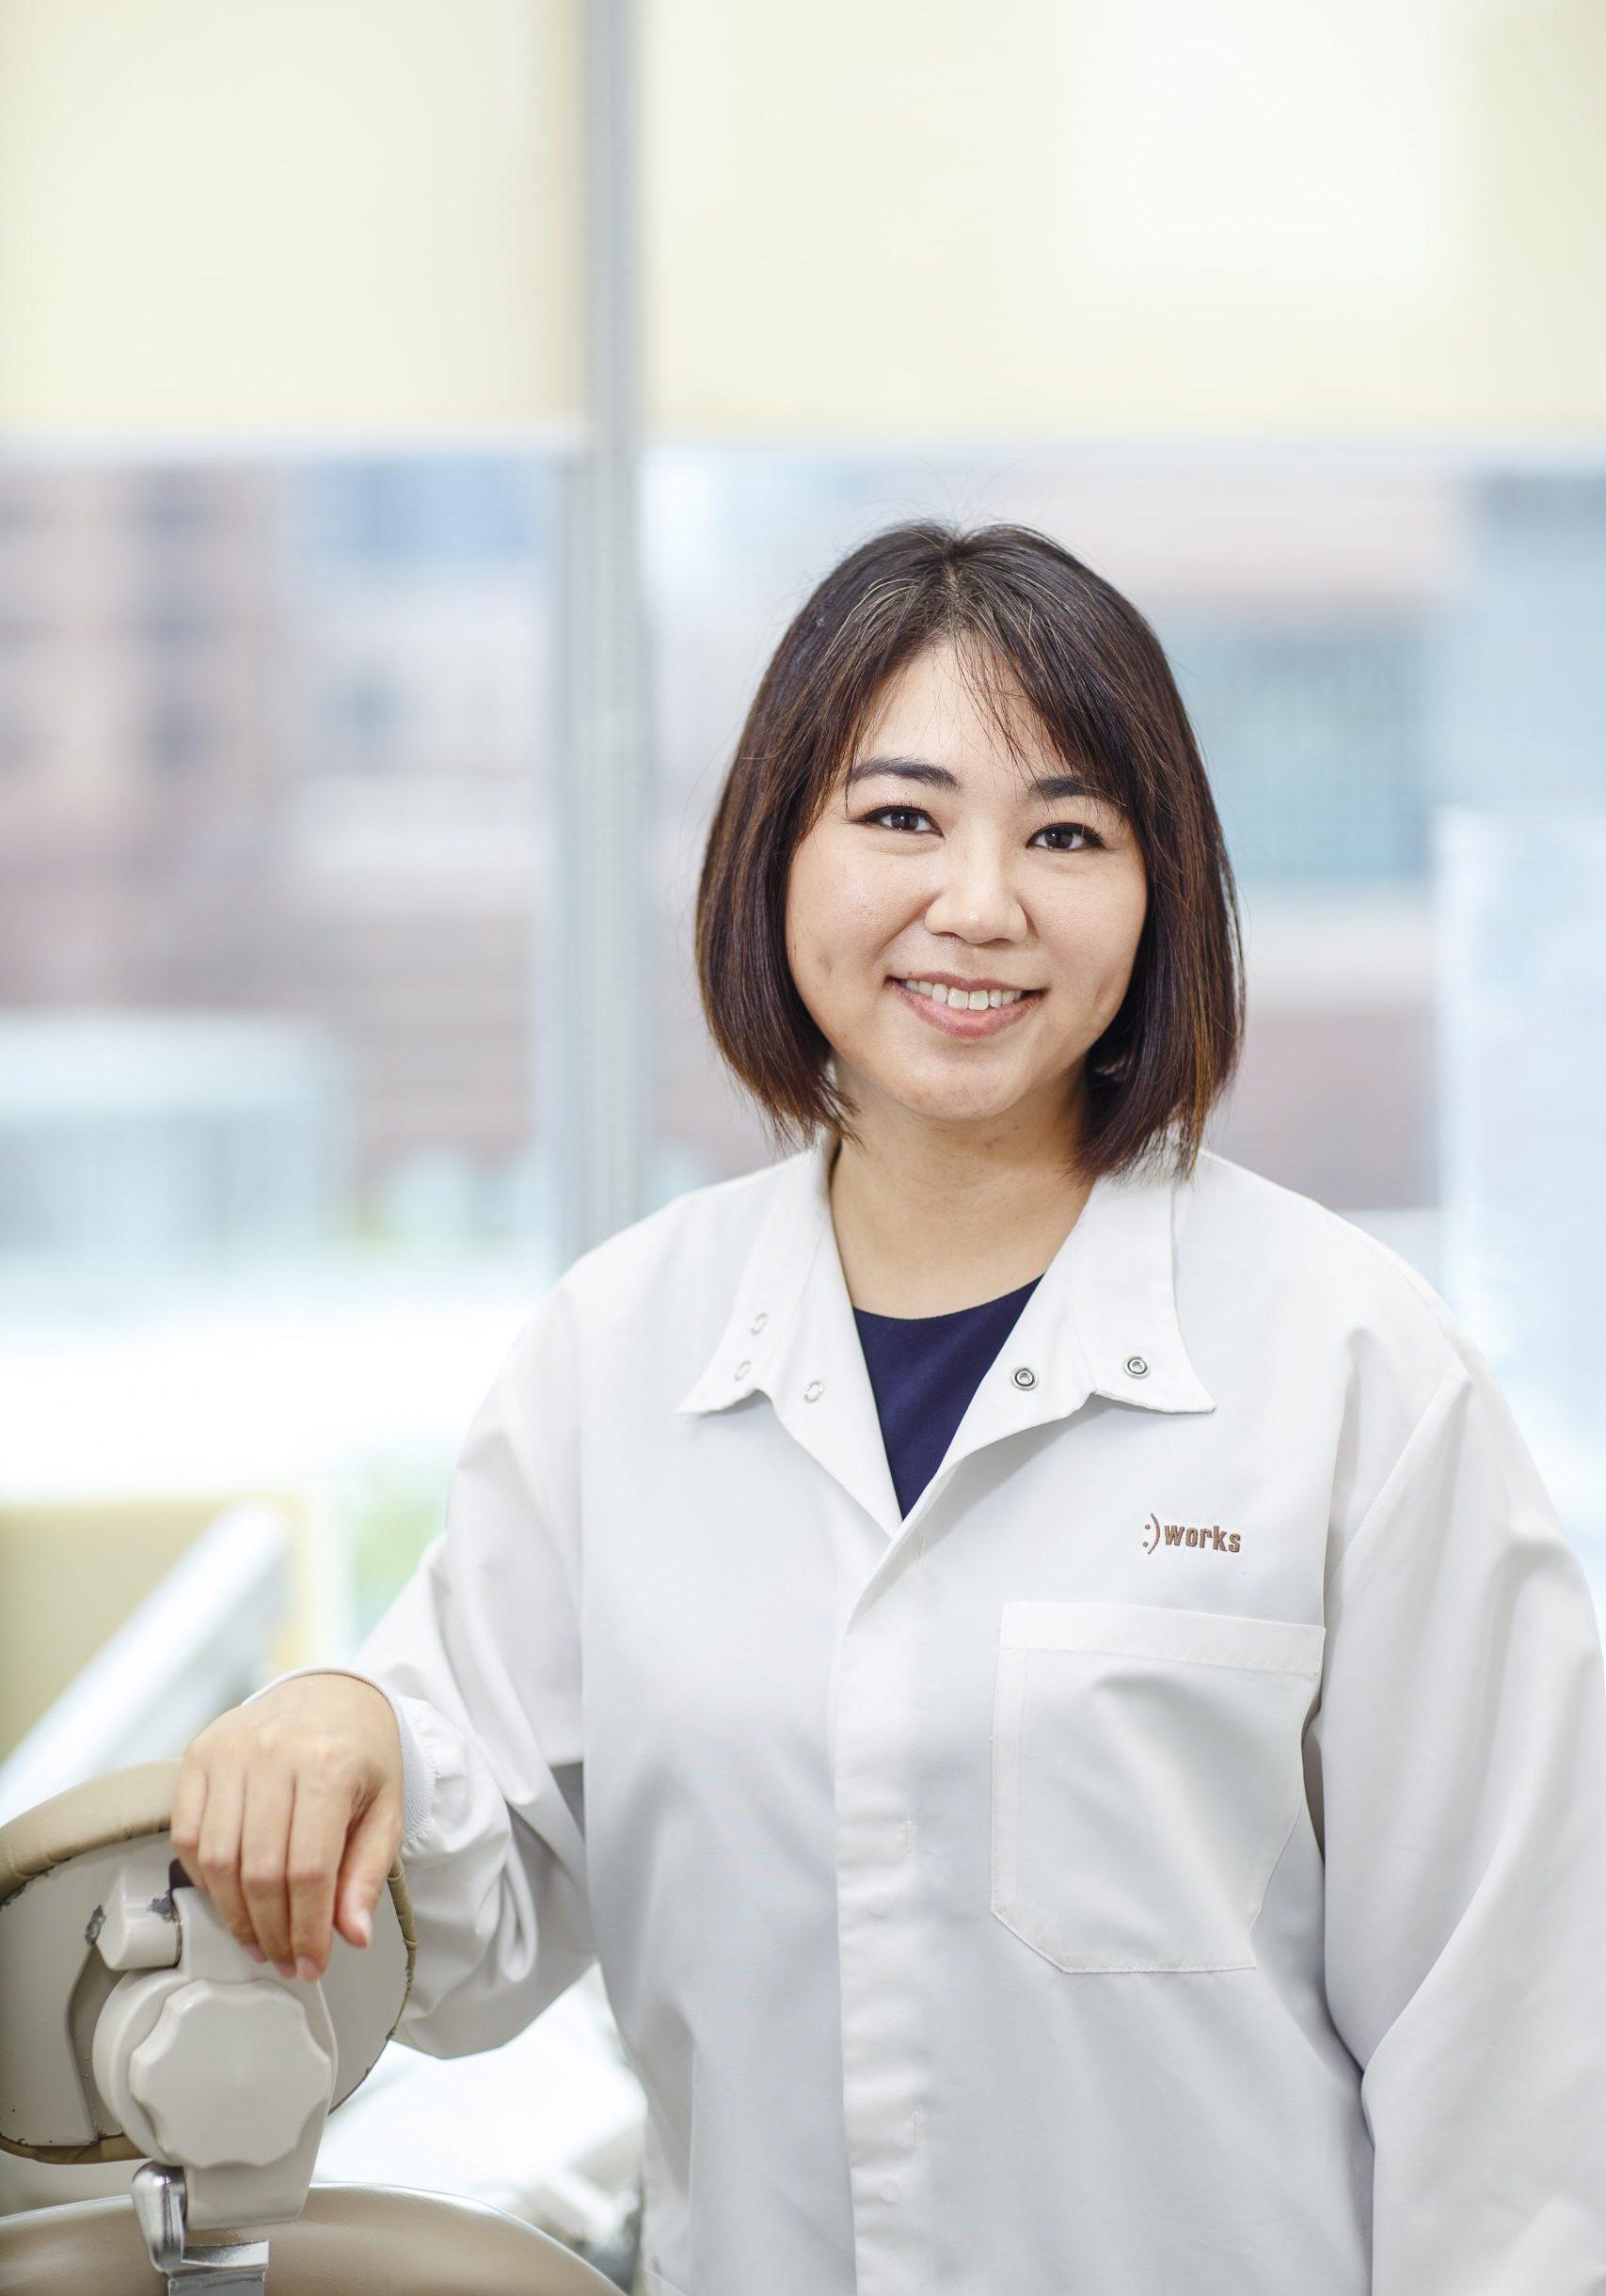 Dr. Geraldine Oh